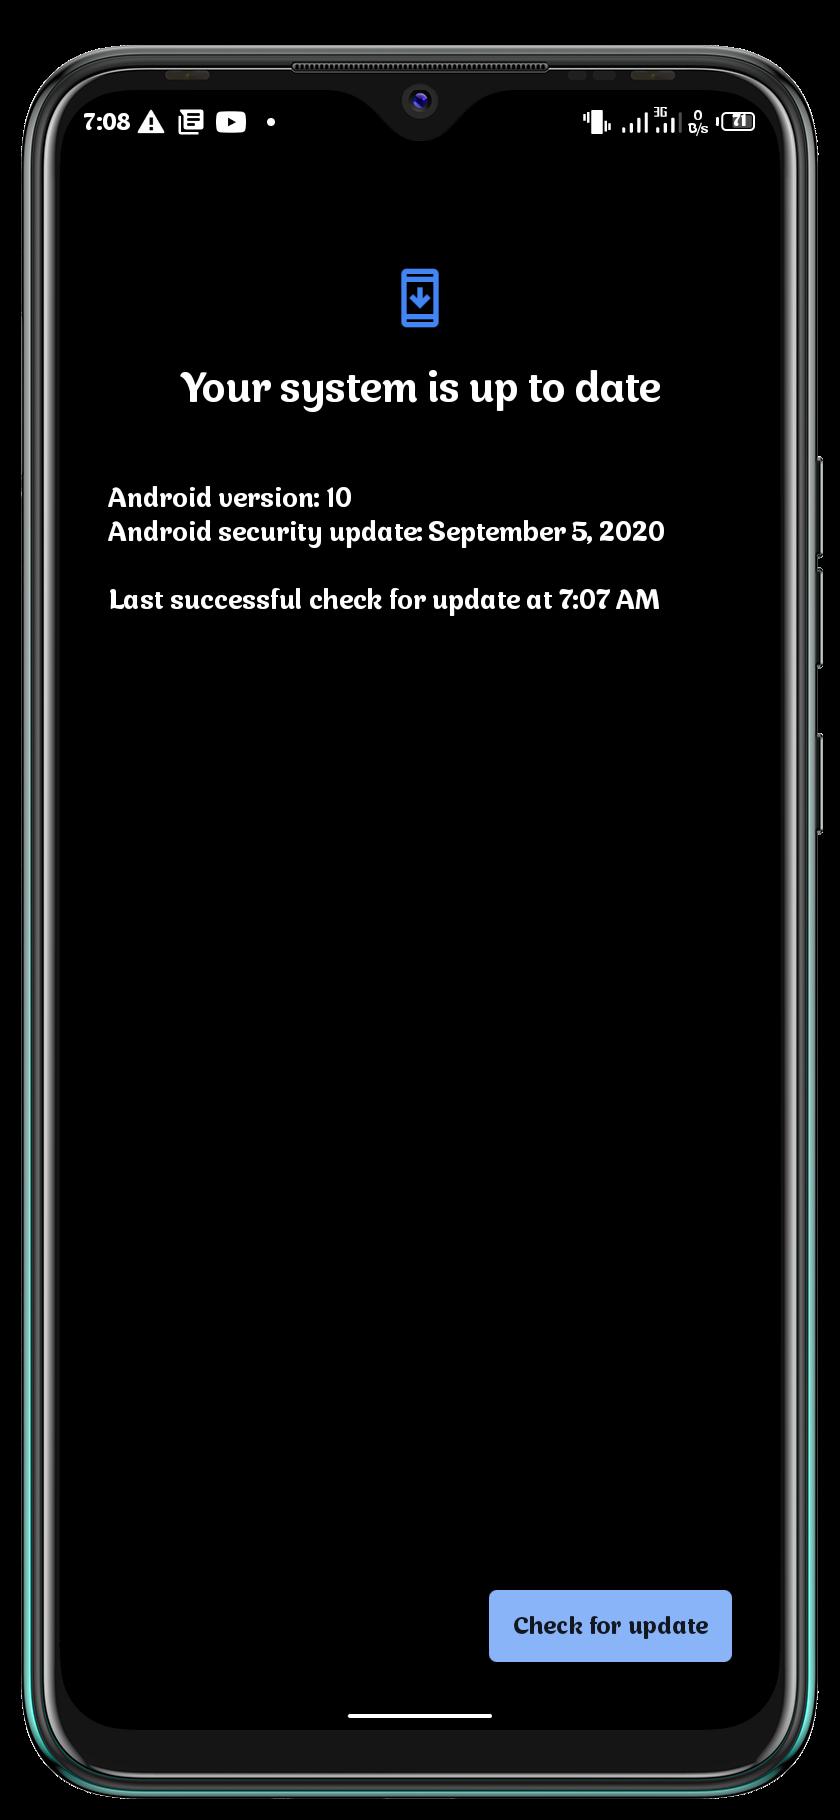 Screenshot_20201121-070805.png